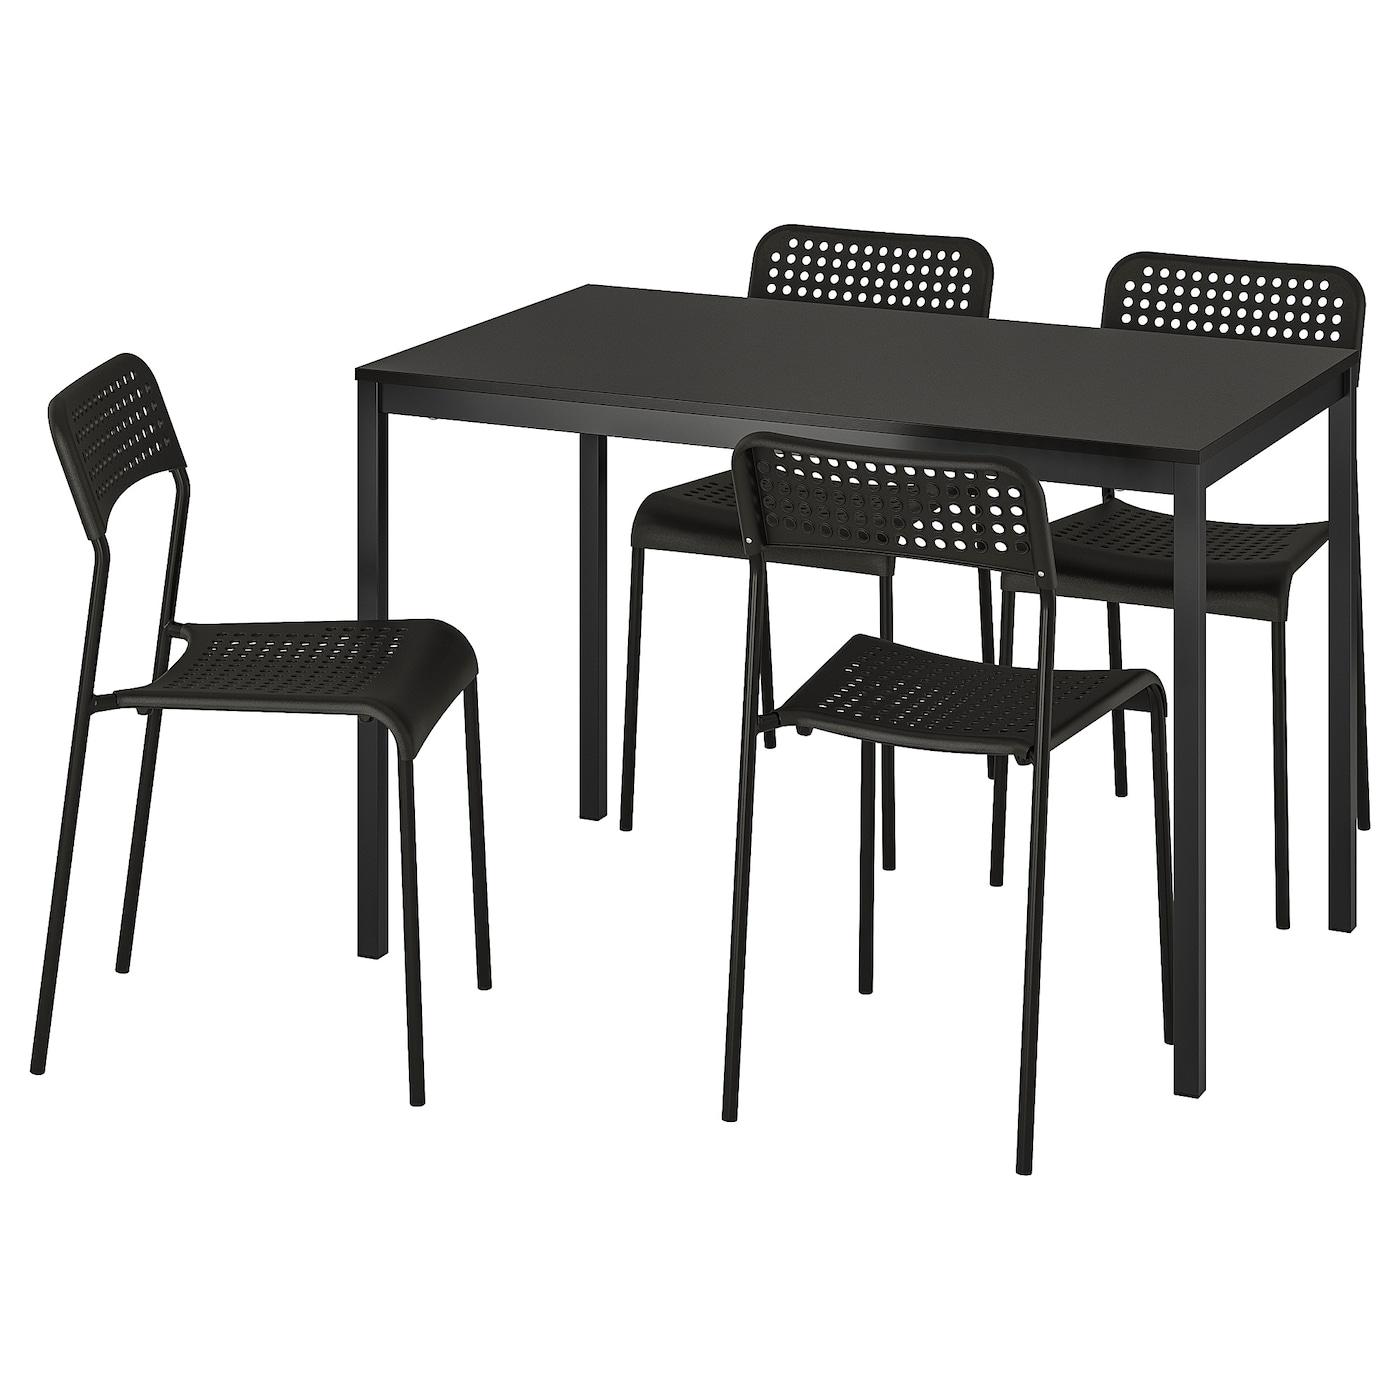 Chaises De Cuisine Ikea: TÄRENDÖ / ADDE Table Et 4 Chaises